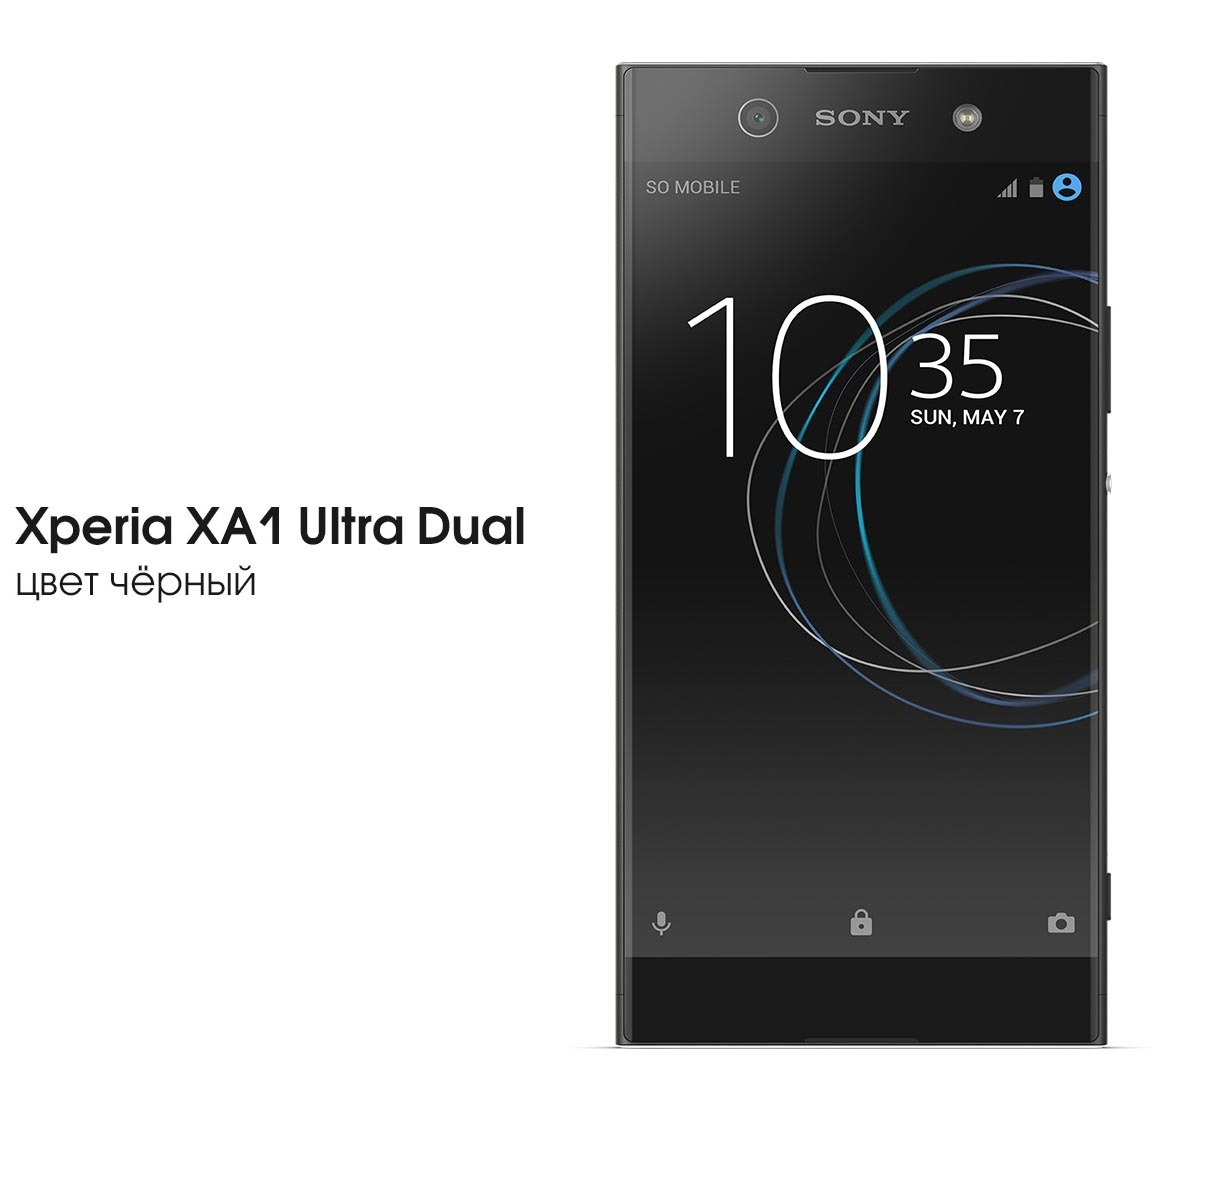 Смартфон Sony Xperia XA1 Ultra Dual, цвет черный